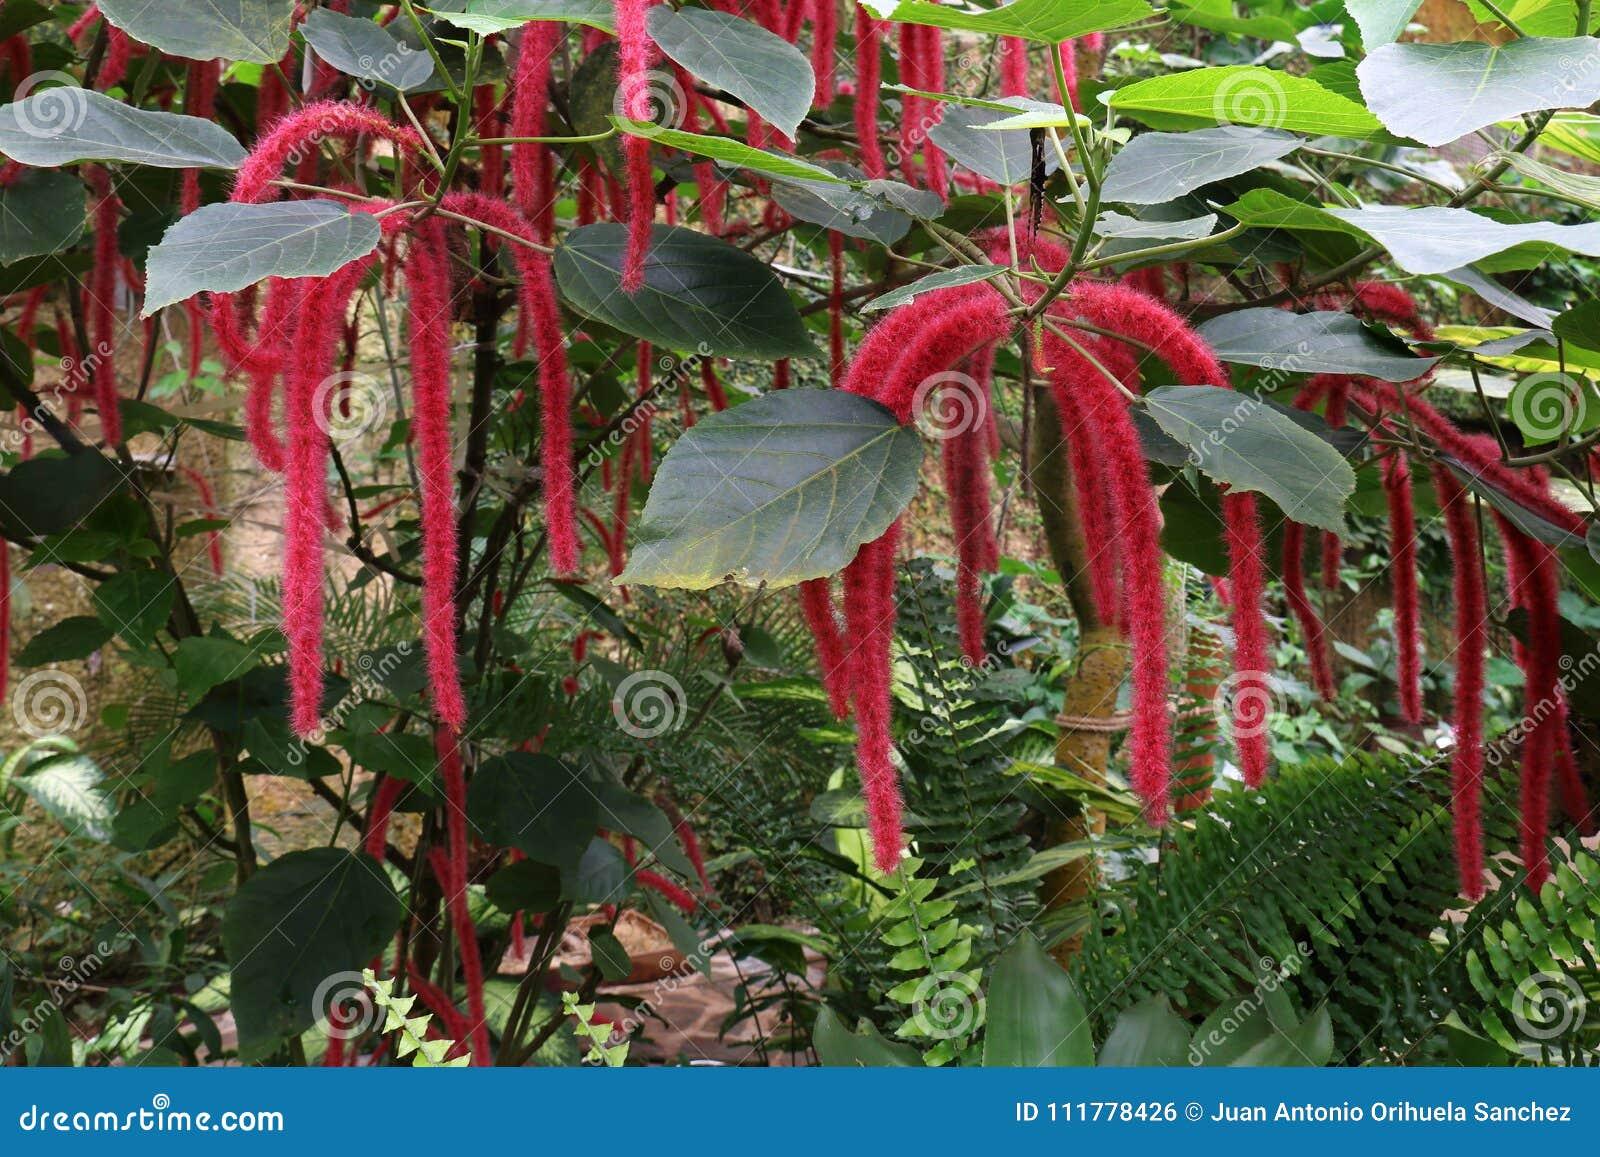 Exotic tropical vegetation